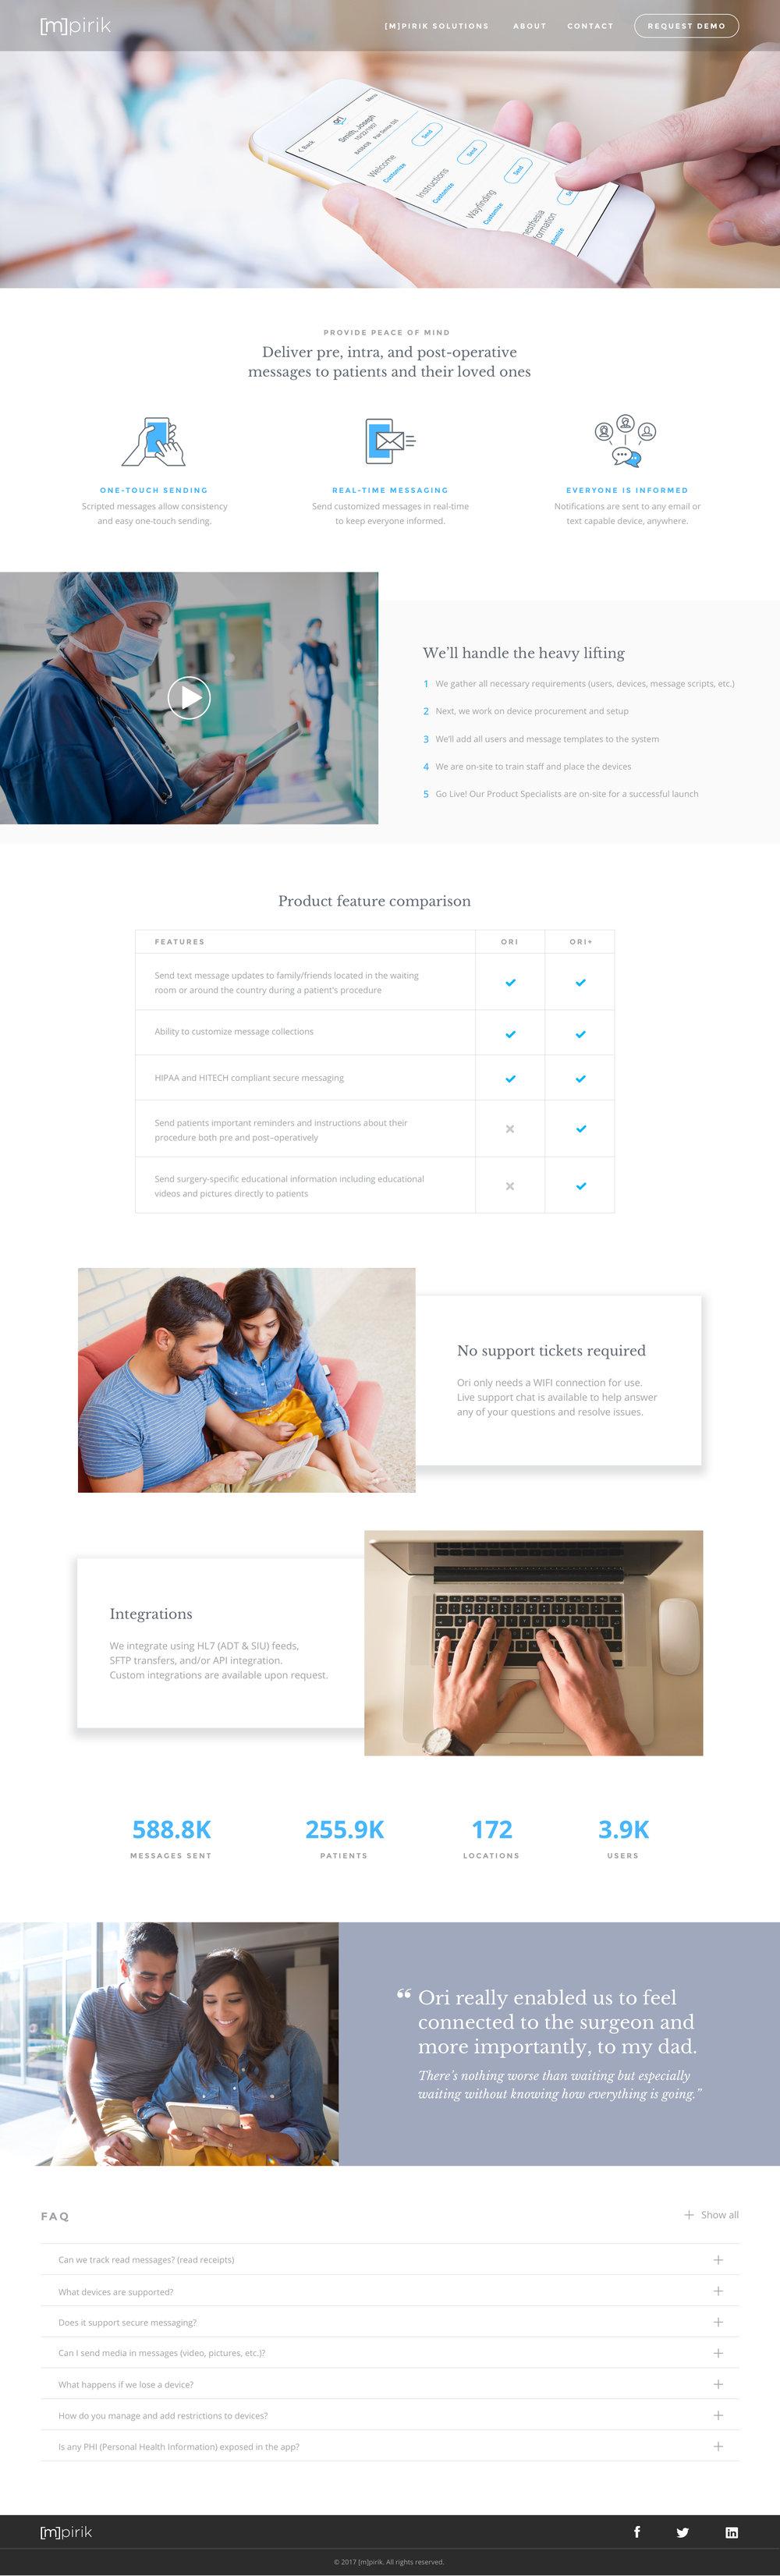 Ori product page.jpg